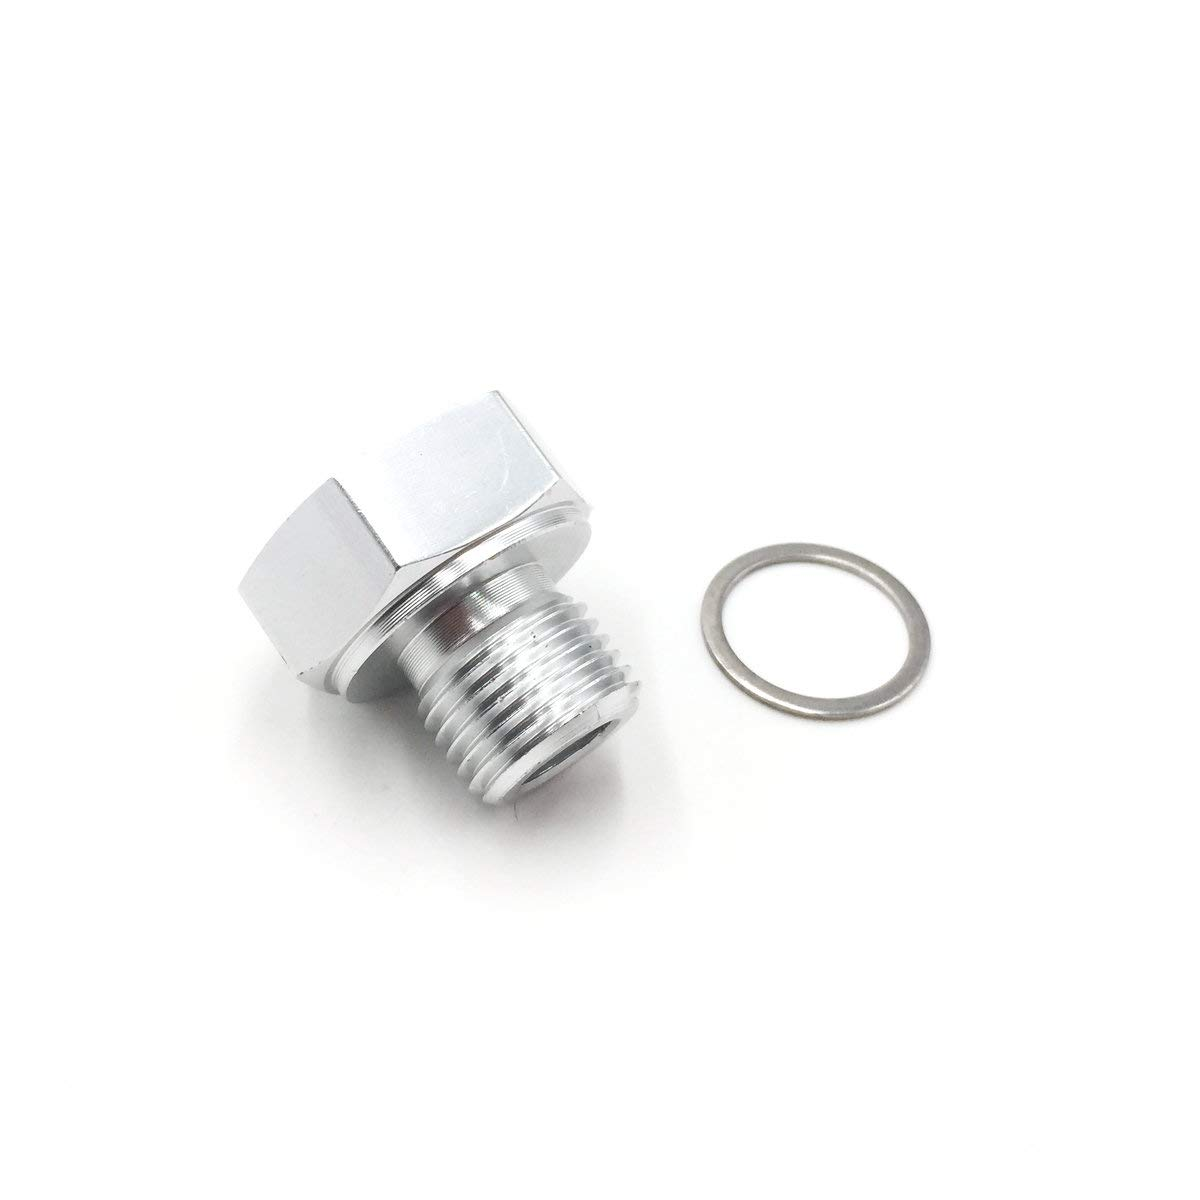 Amazon com: AIPICO Oil Pressure Sensor Adapter 1/8 NPT